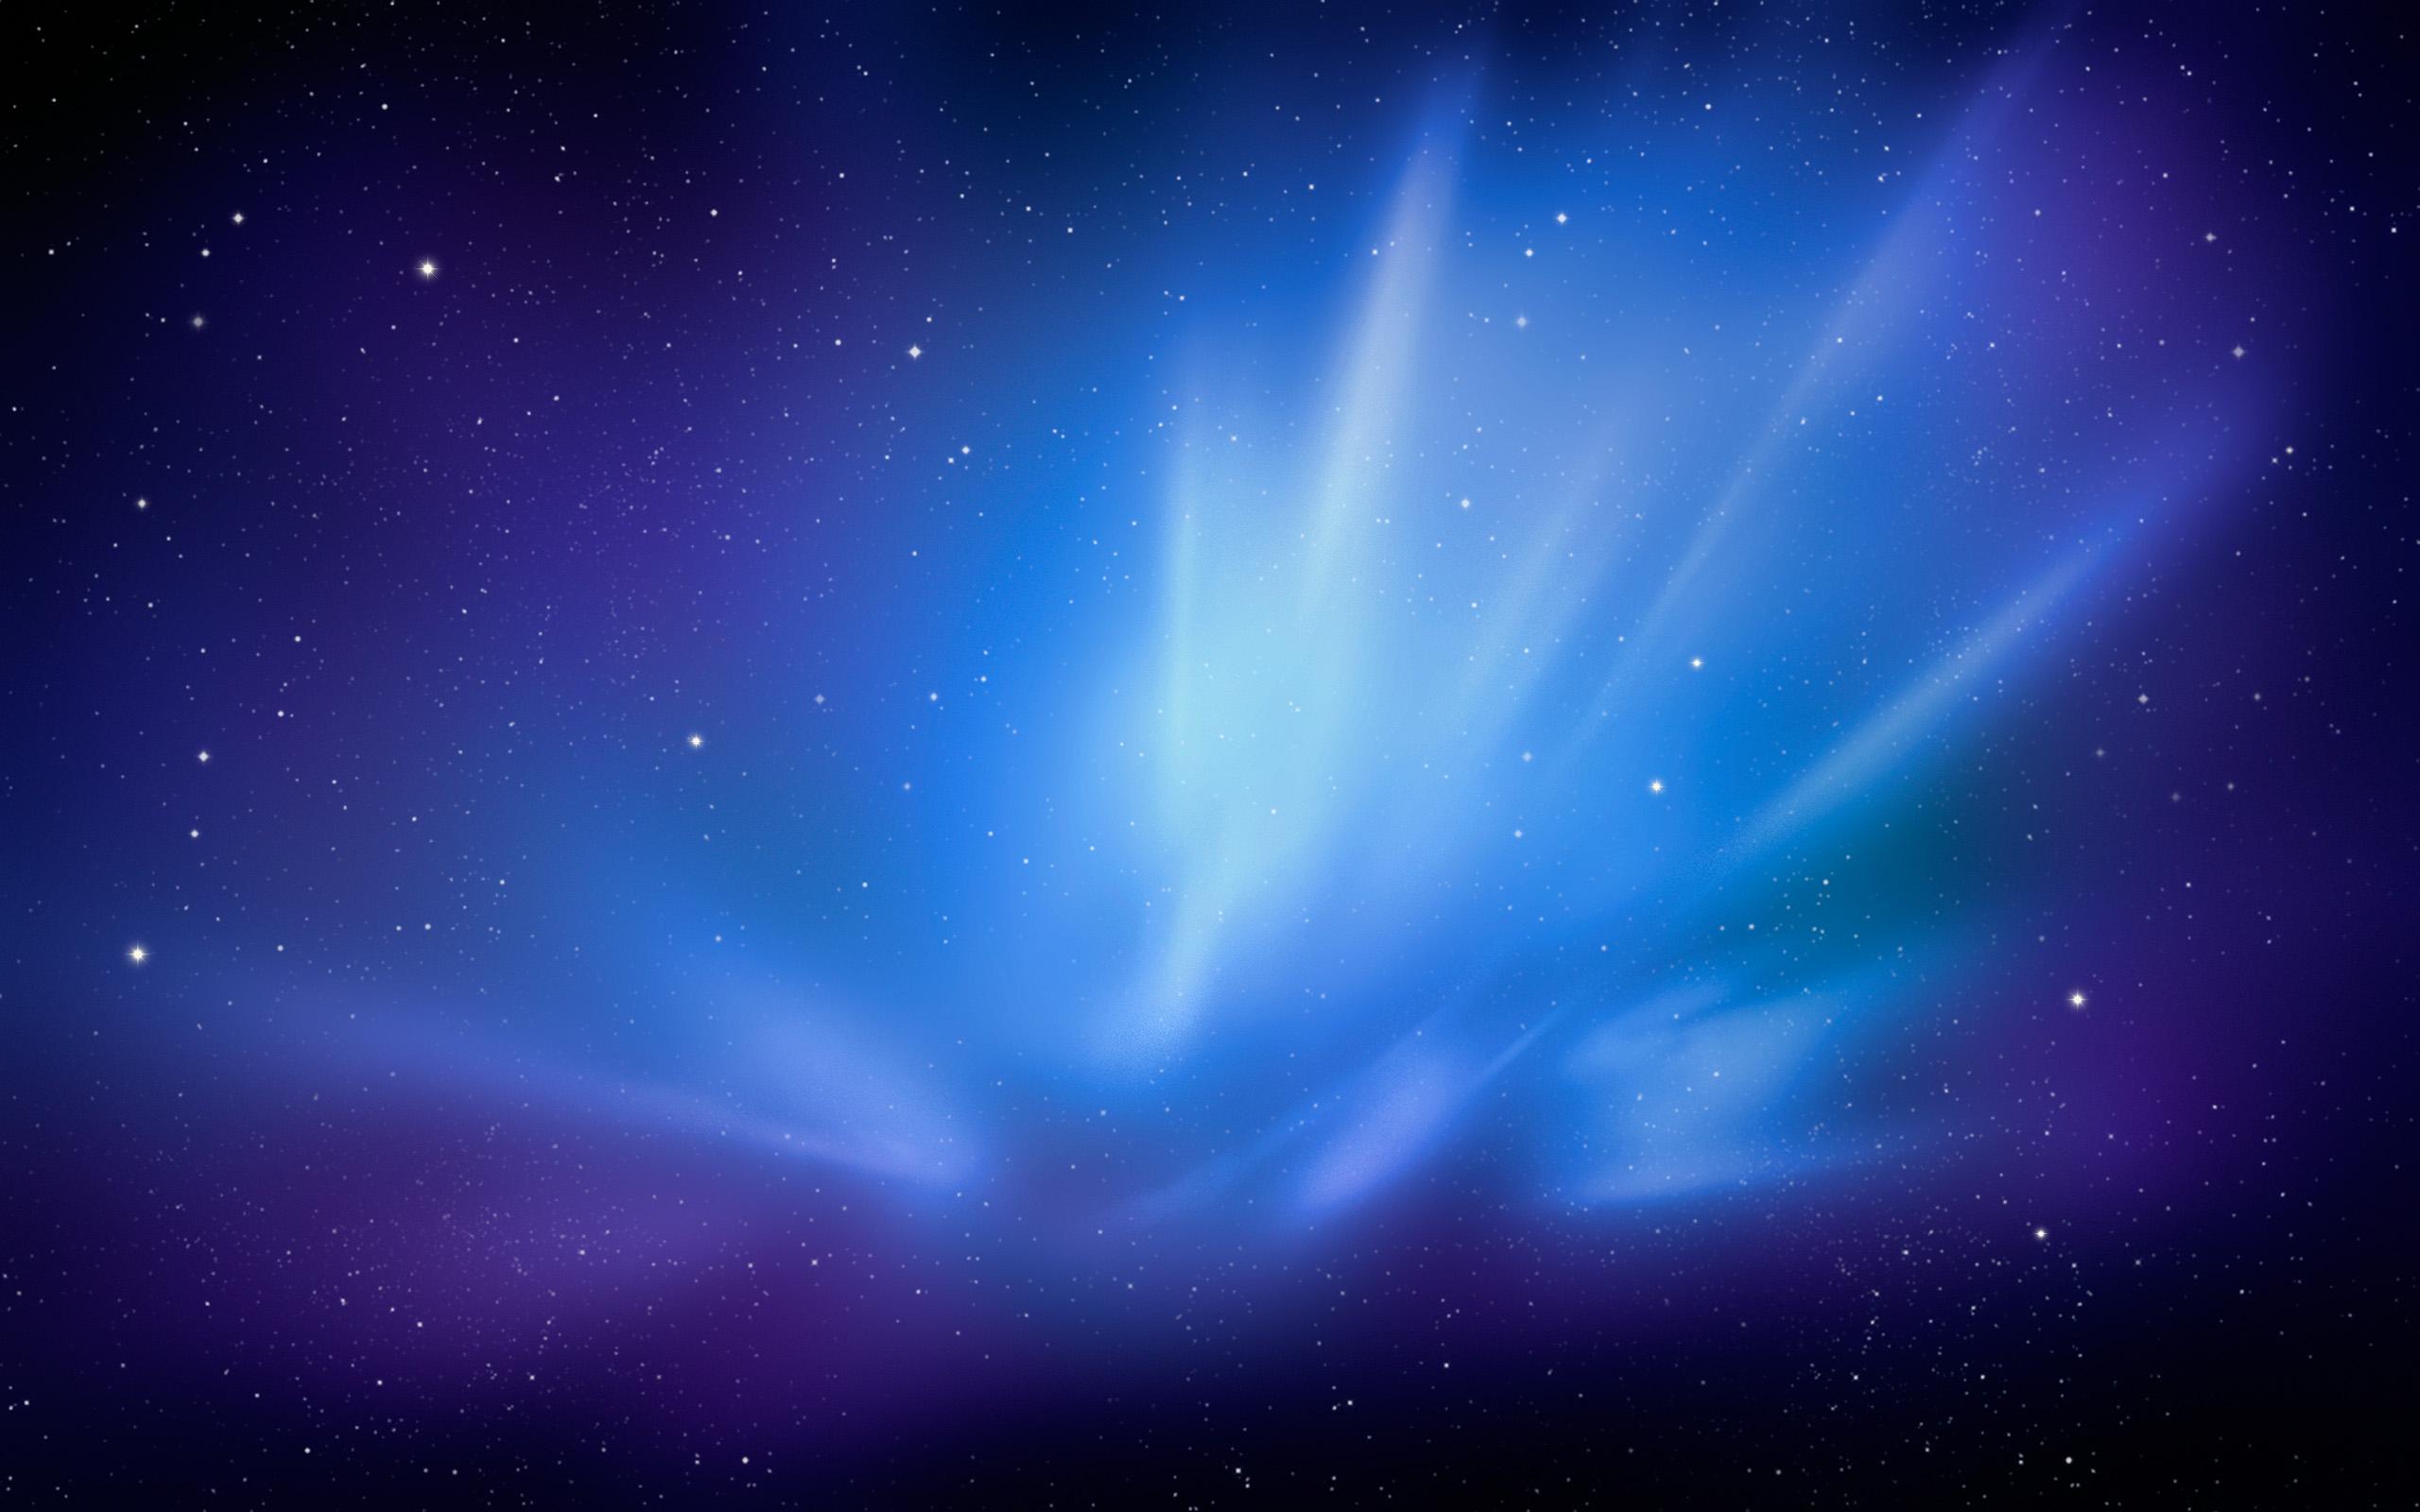 Mac OS X Snow Leopard Server Default Wallpaper 2560x1600